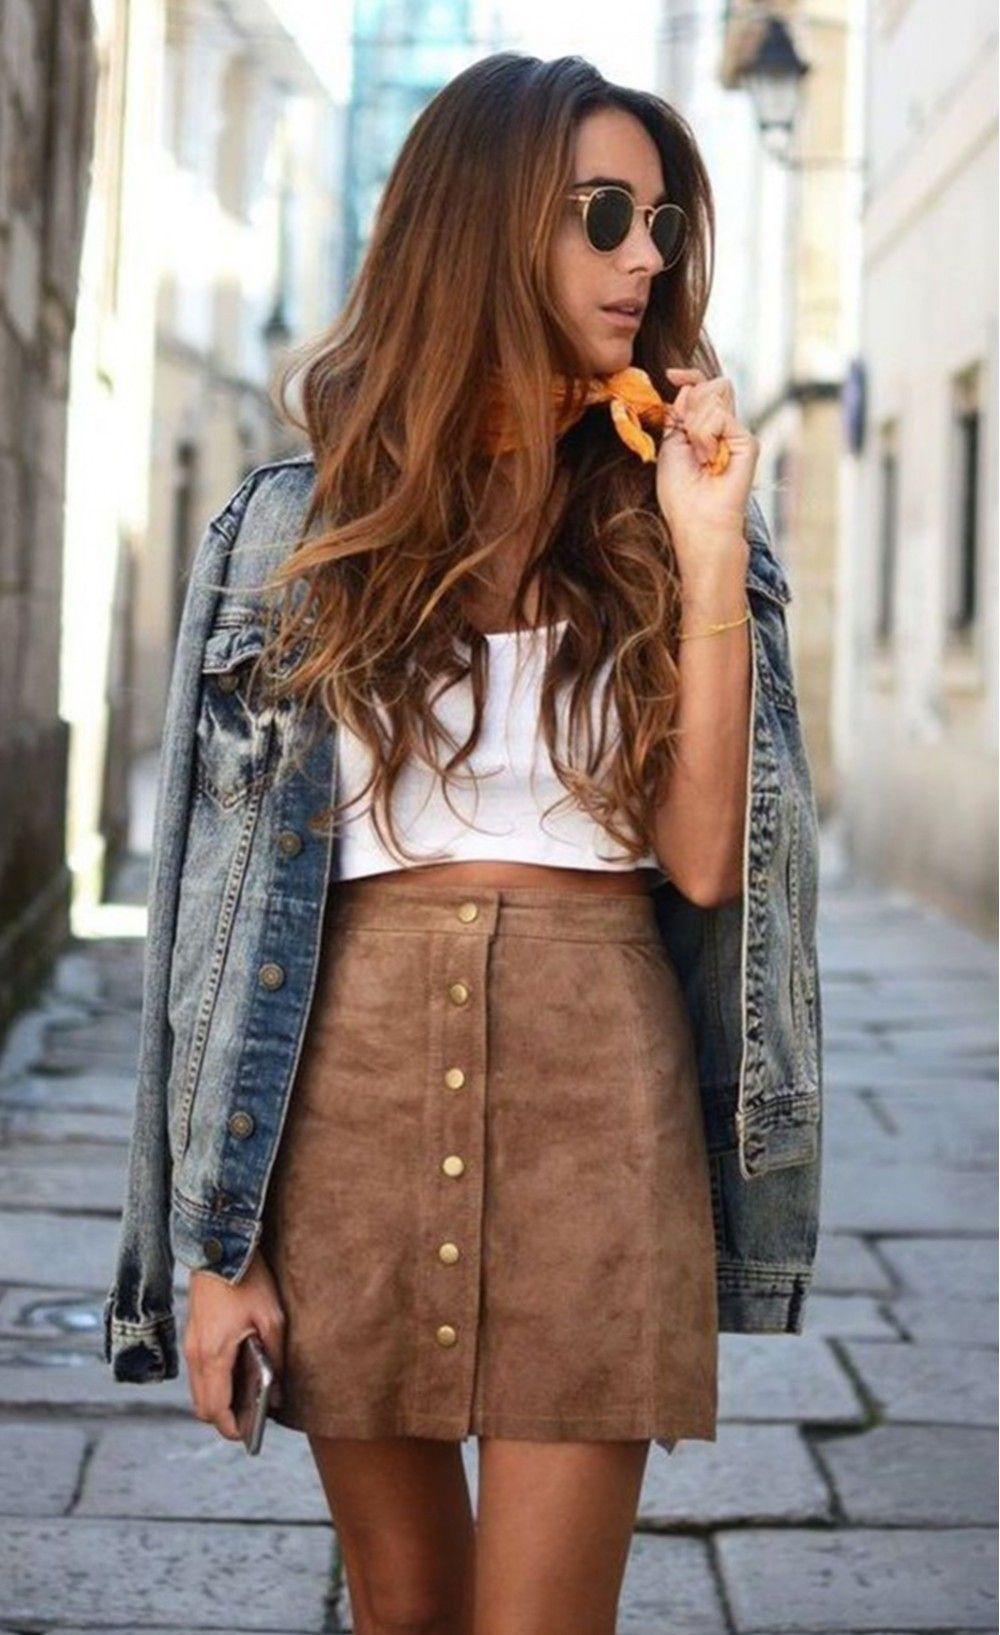 1d35af0528 Vintage Fashion Corduroy High Waist Mini Skirt | Loving the Clothes ...